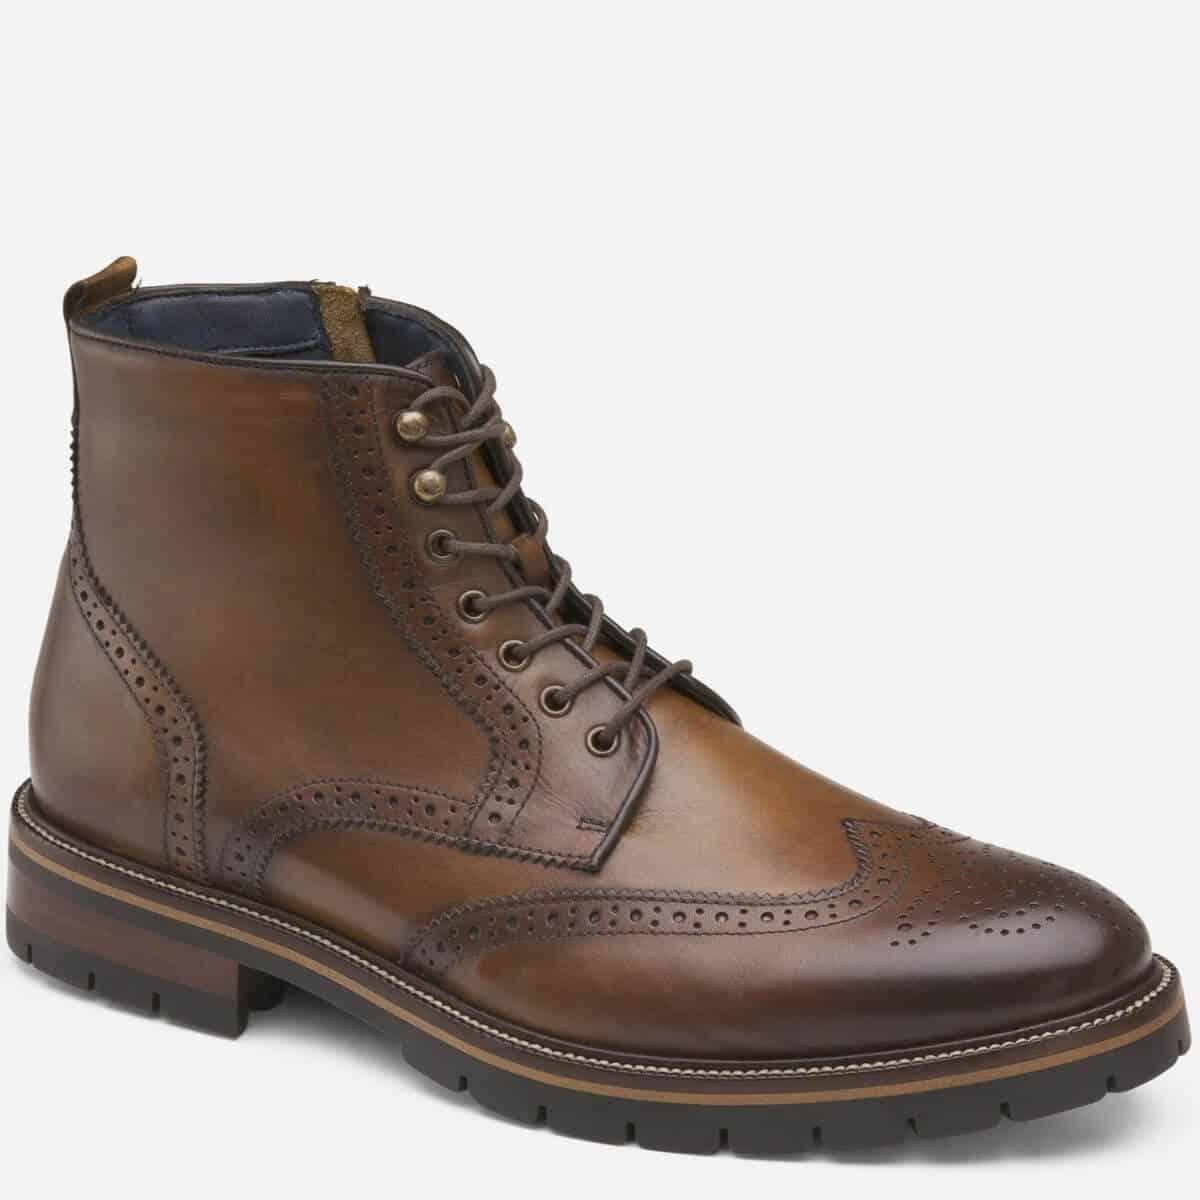 Brown leather wingtip brogue boot.